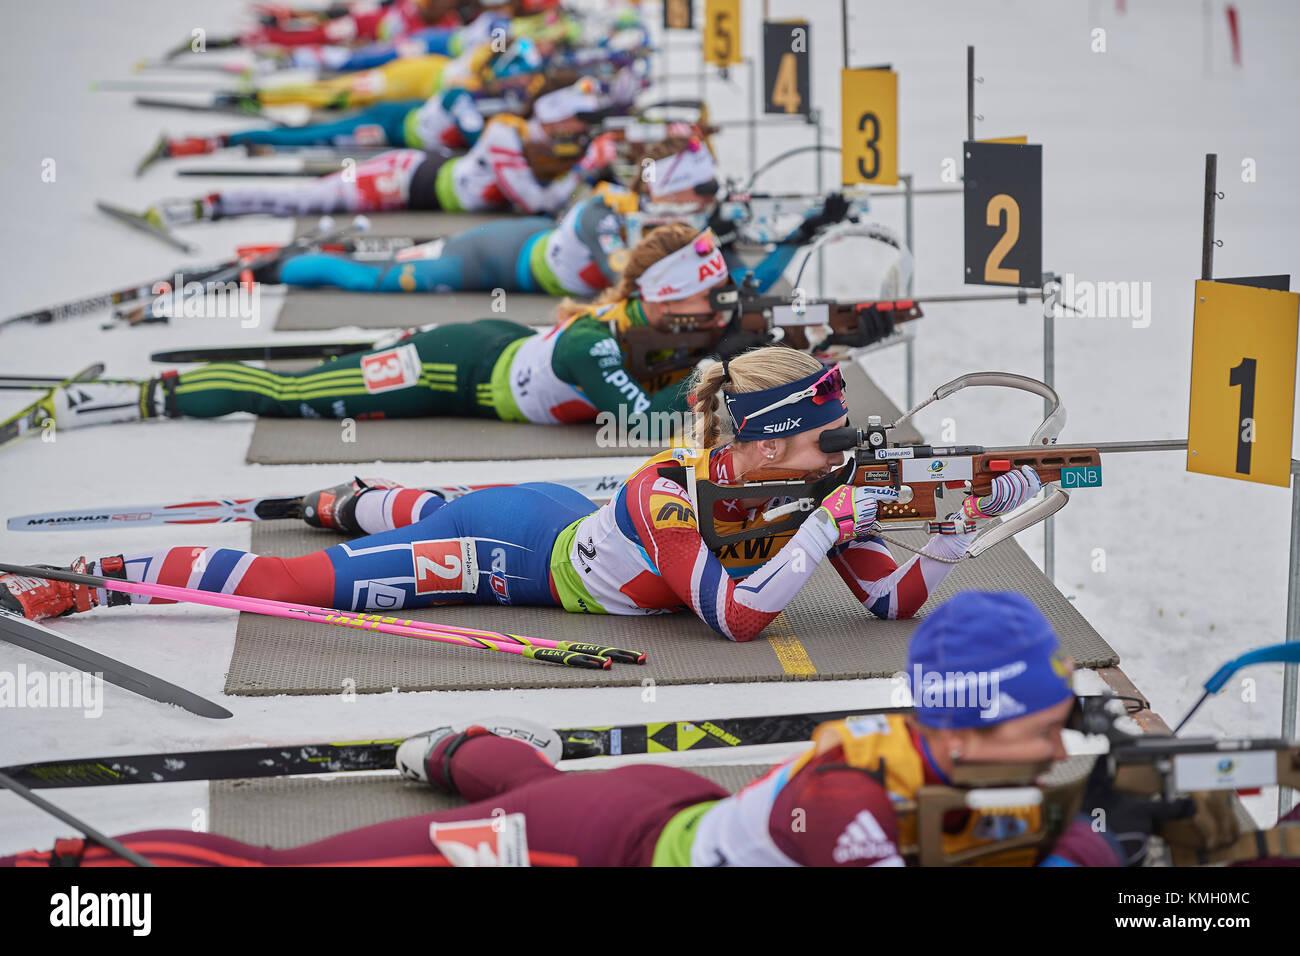 Lenzerheide, Switzerland. 8th Dec, 2017. Ladies shooting during the IBU Biathlon Cup Mixed Relay in Lenzerheide. - Stock Image